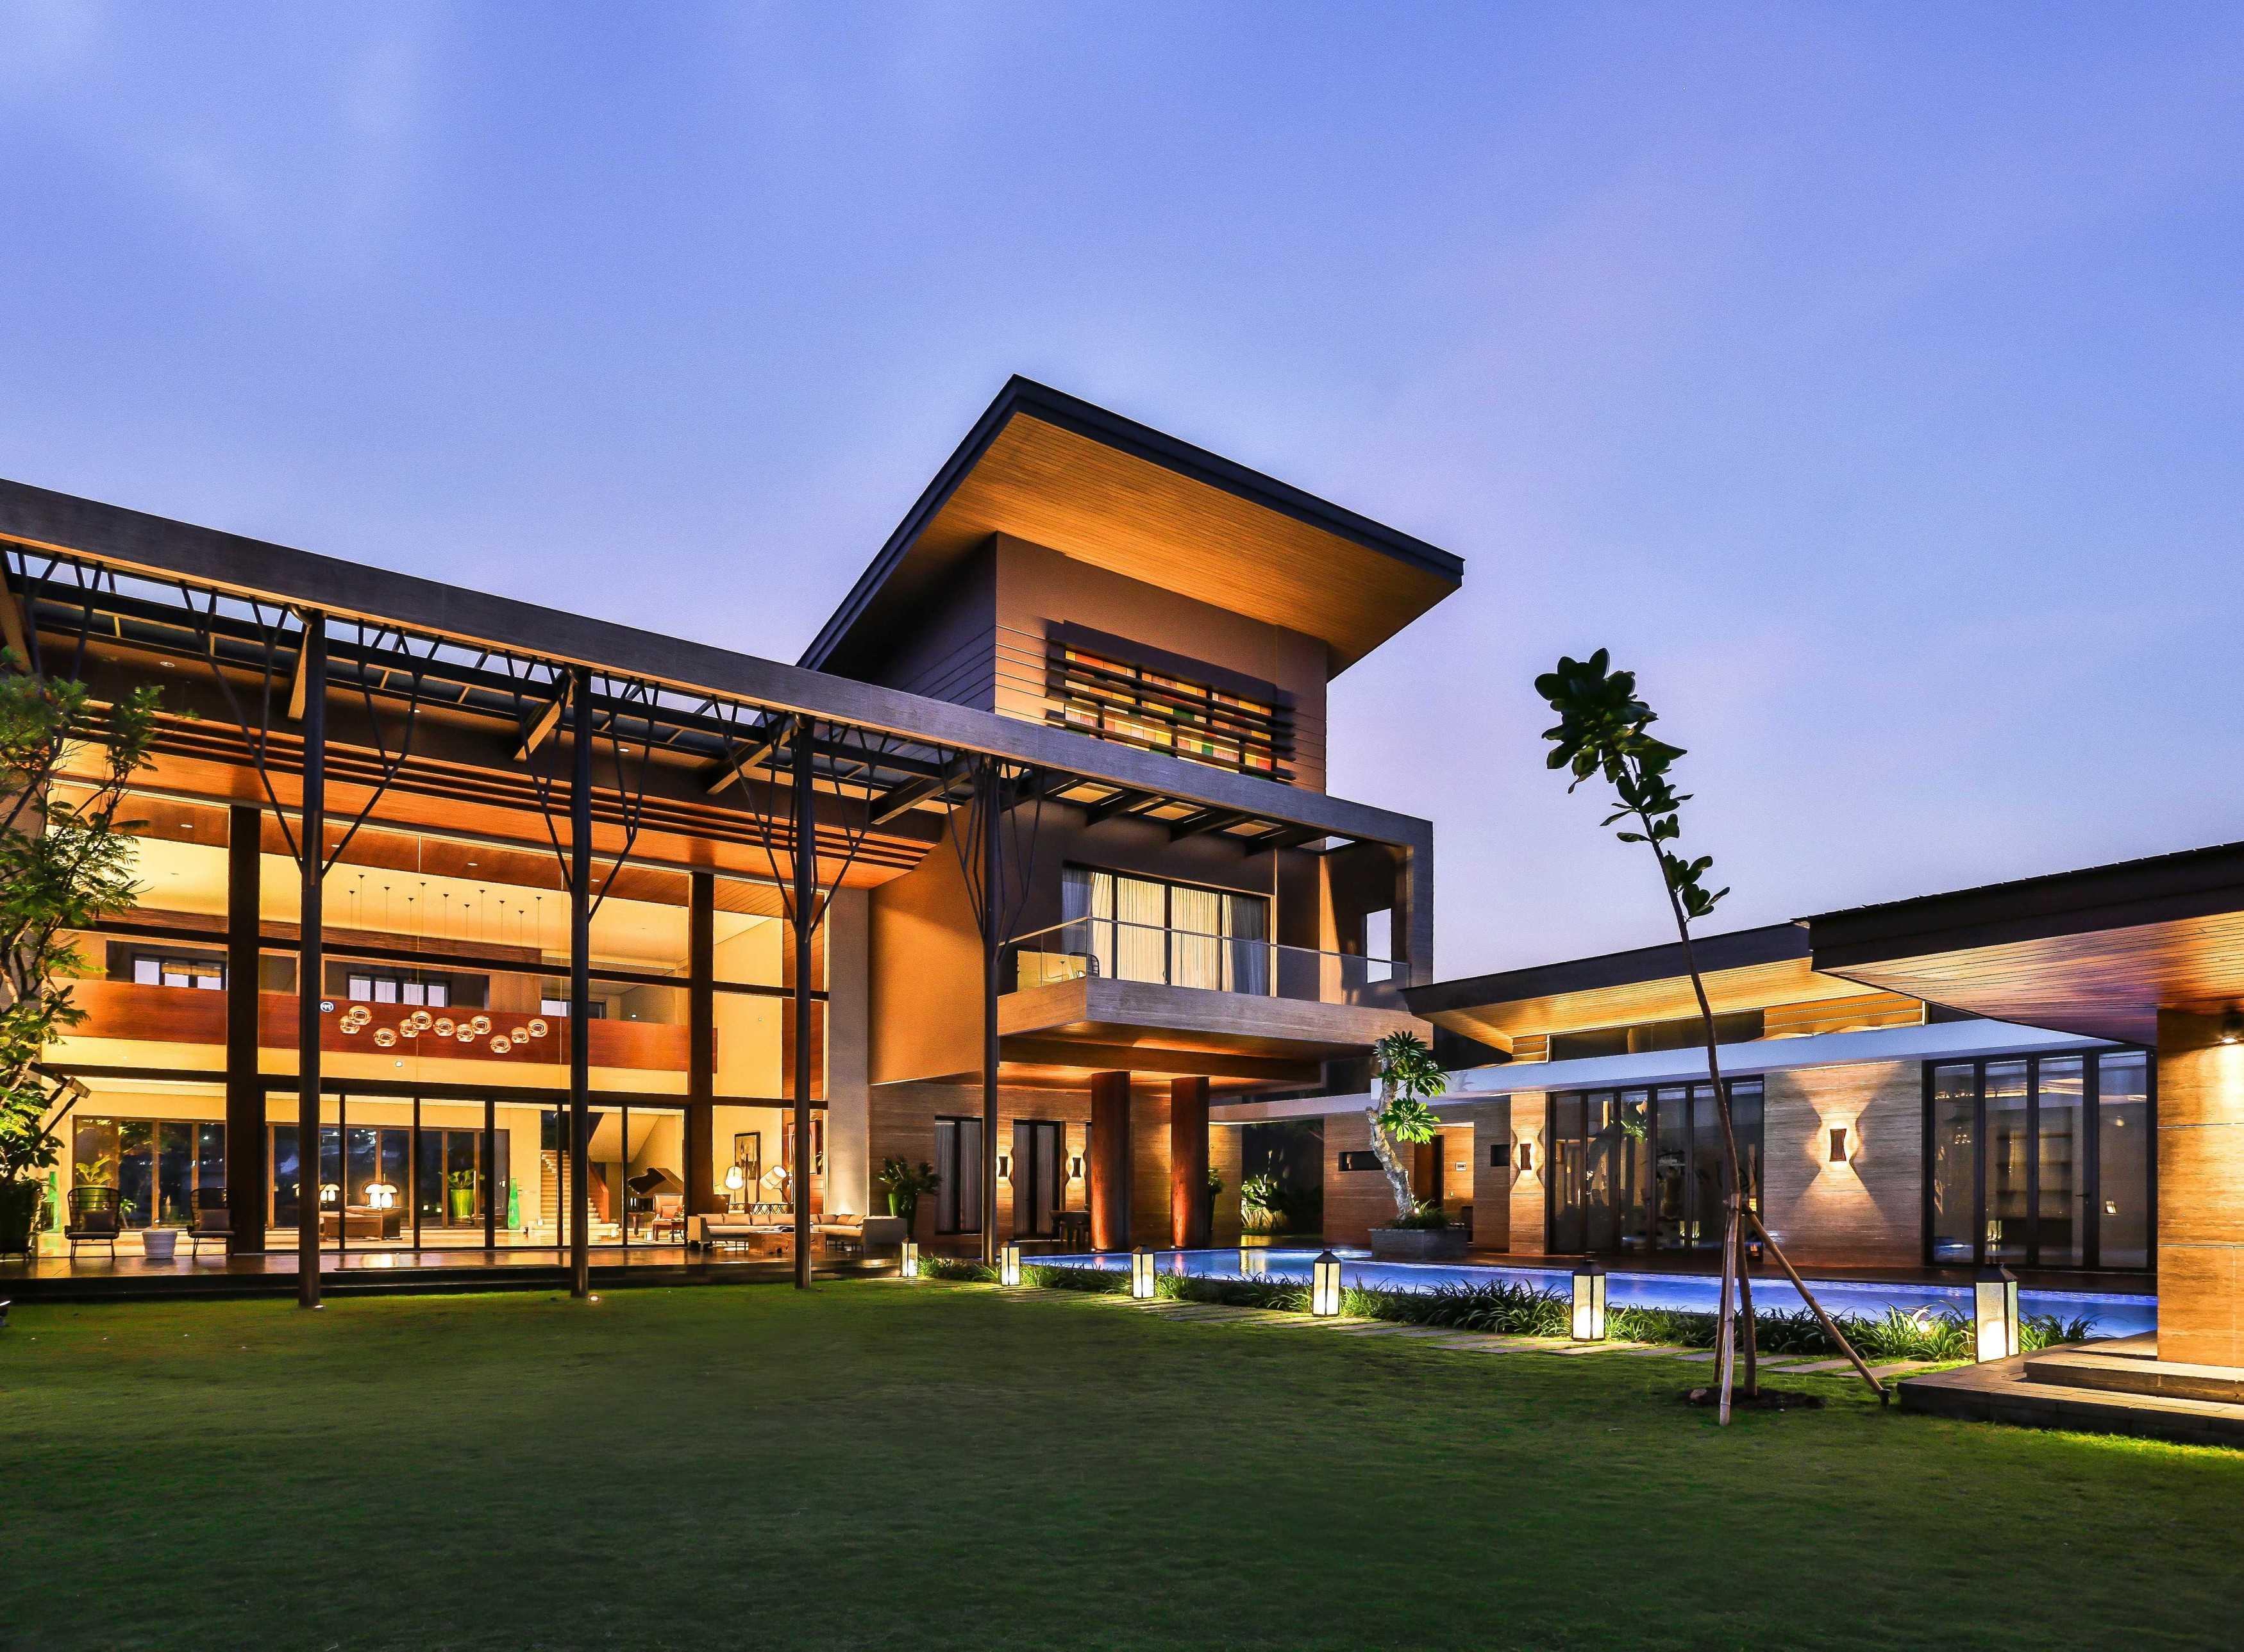 Lex And Architects Dipo Residence Jawa Tengah, Indonesia Jawa Tengah, Indonesia Lex-And-Architects-Dipo-Residence   68810